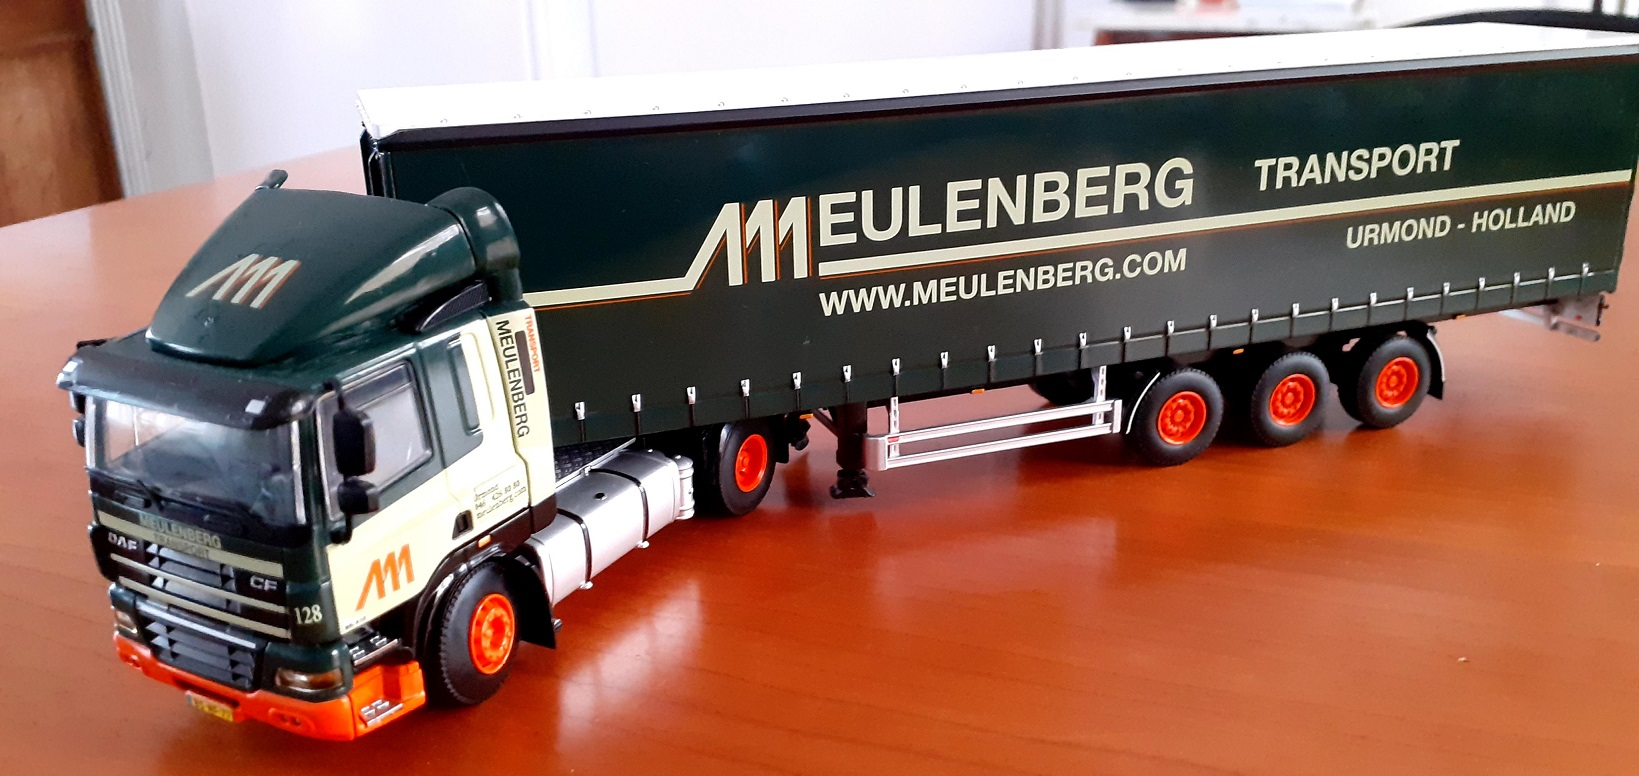 Meulenberg-Xavier-Walstock-berwerkte-delen-modellen-(33)